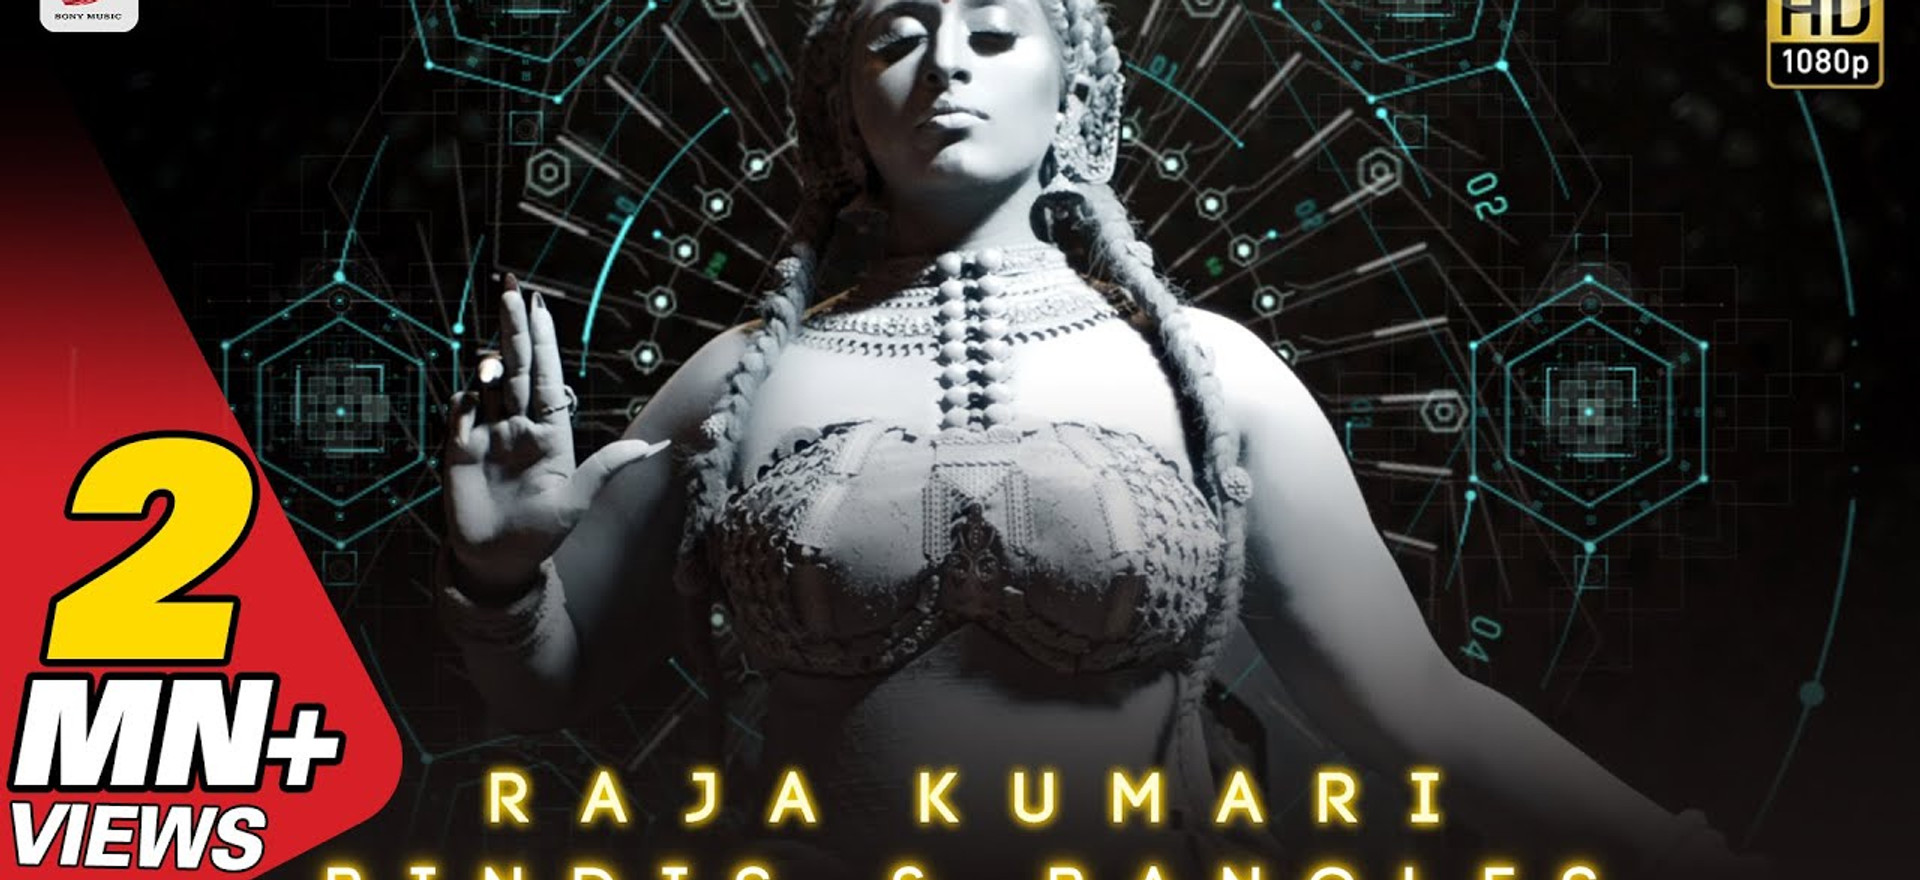 Raja Kumari - Bindis and Bangles (Official Music Video)